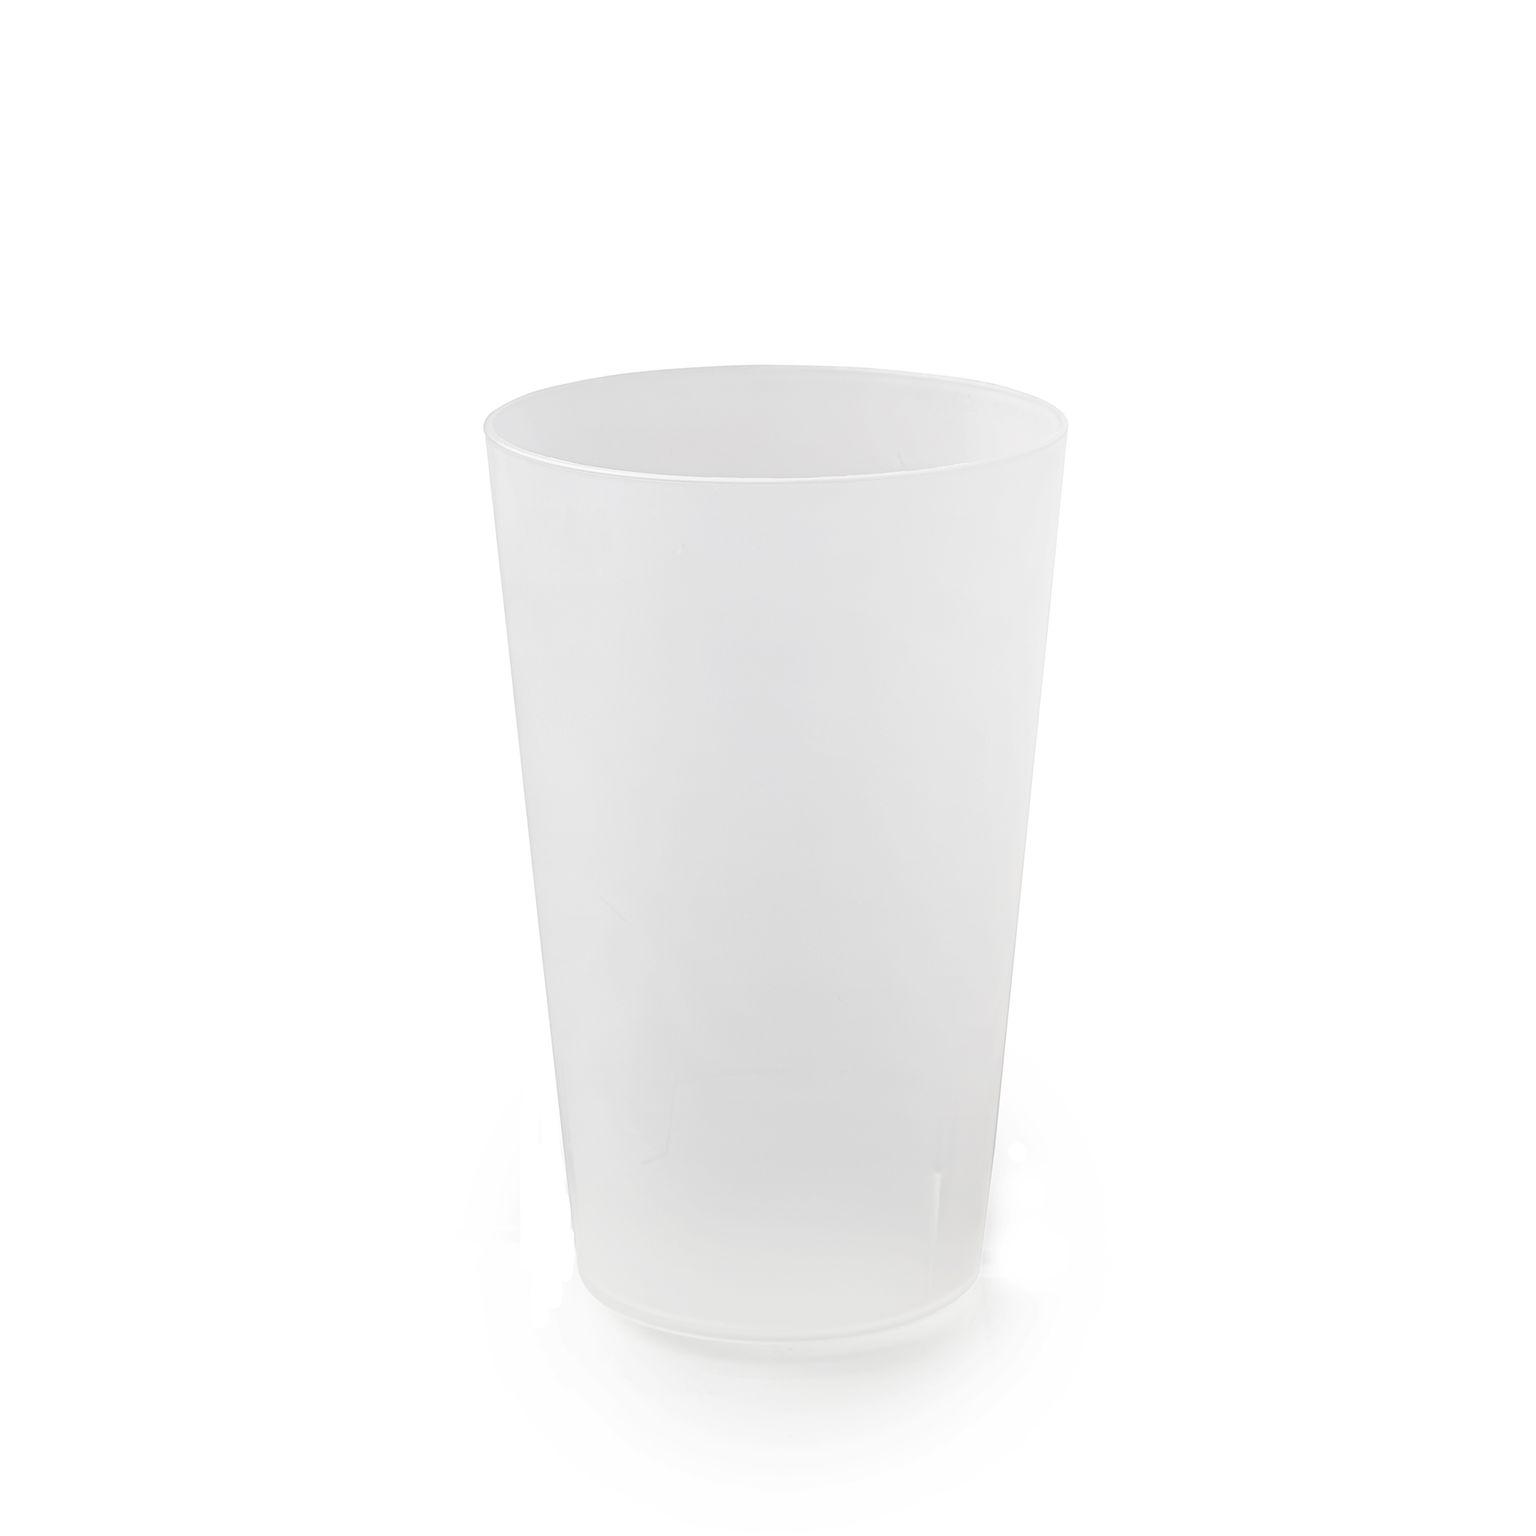 Gobelet réutilisable ECO300 (blanc)